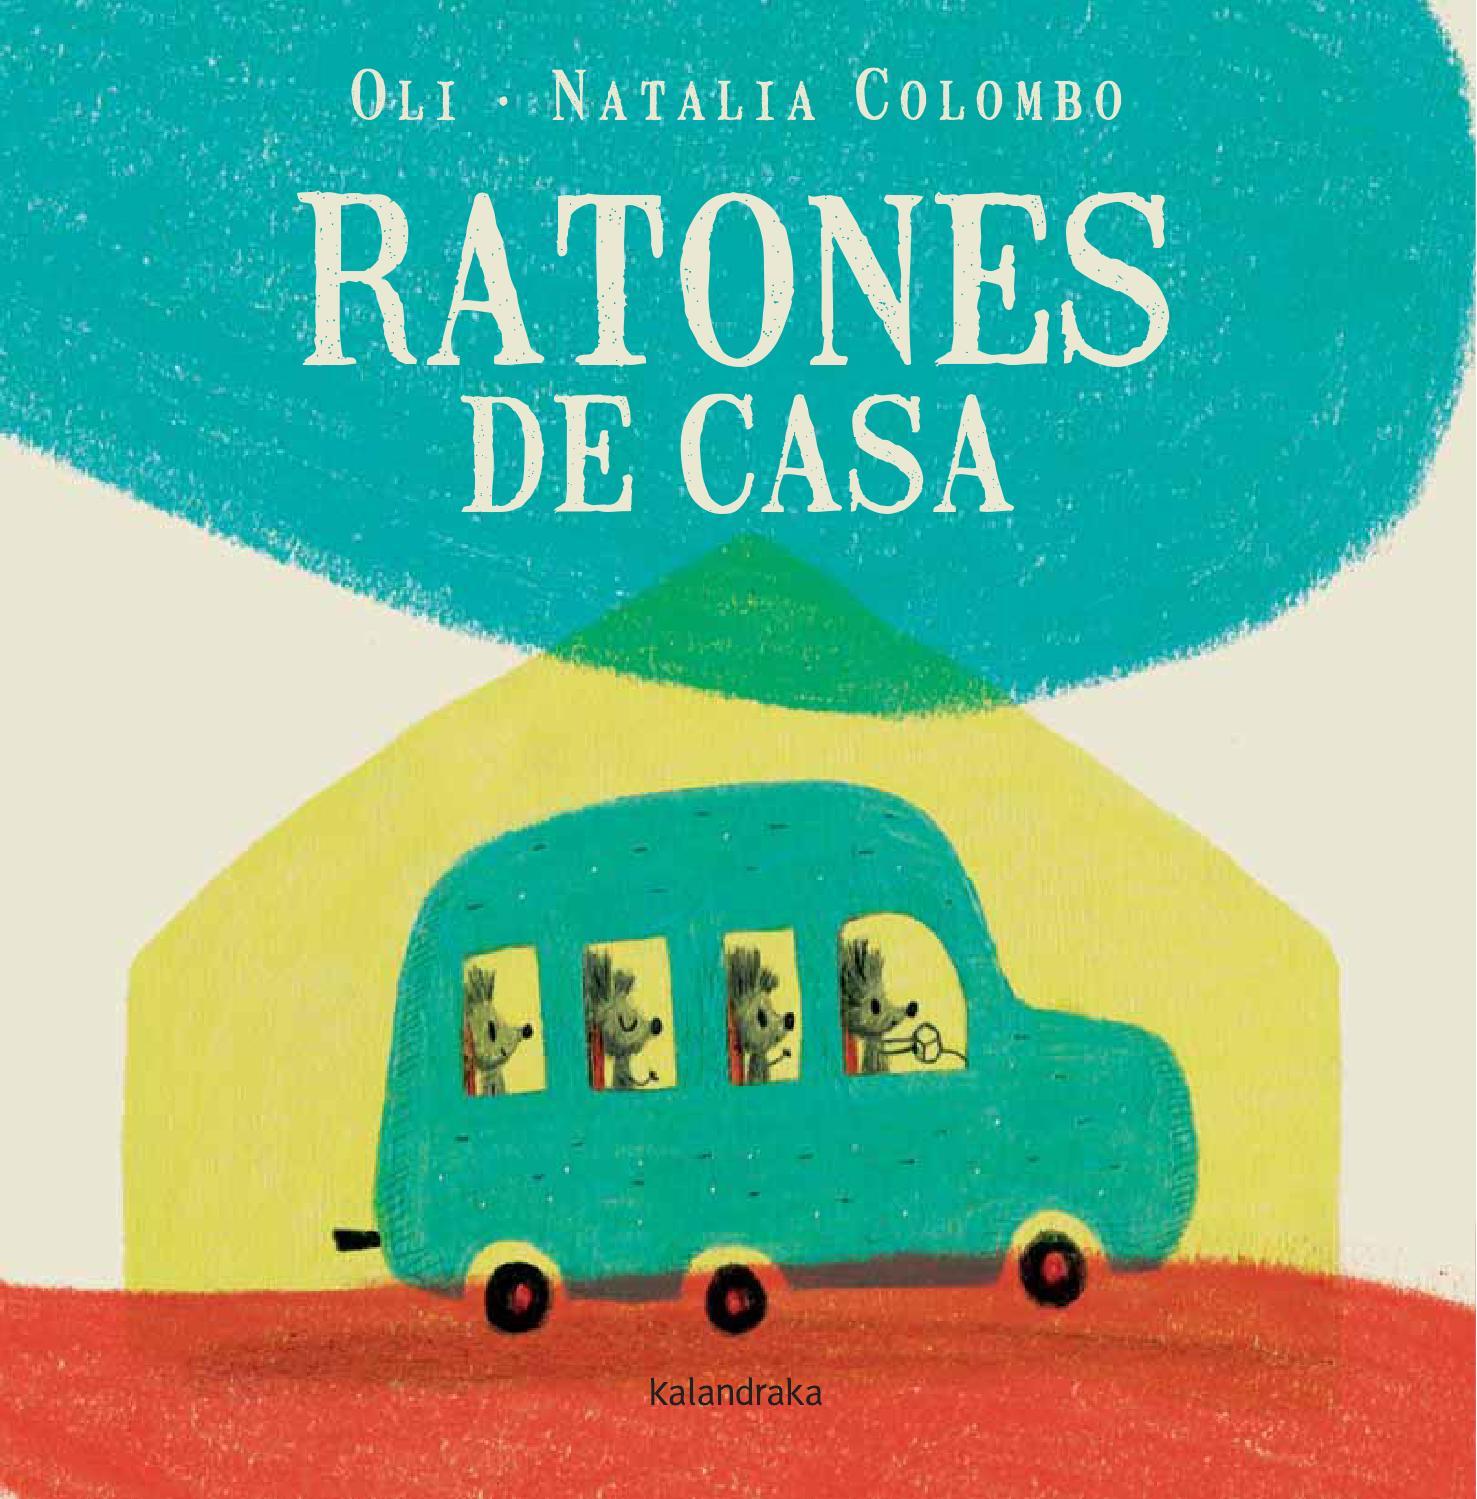 Ratones de casa c oli natalia colombo by issuu - Ratones en casa ...